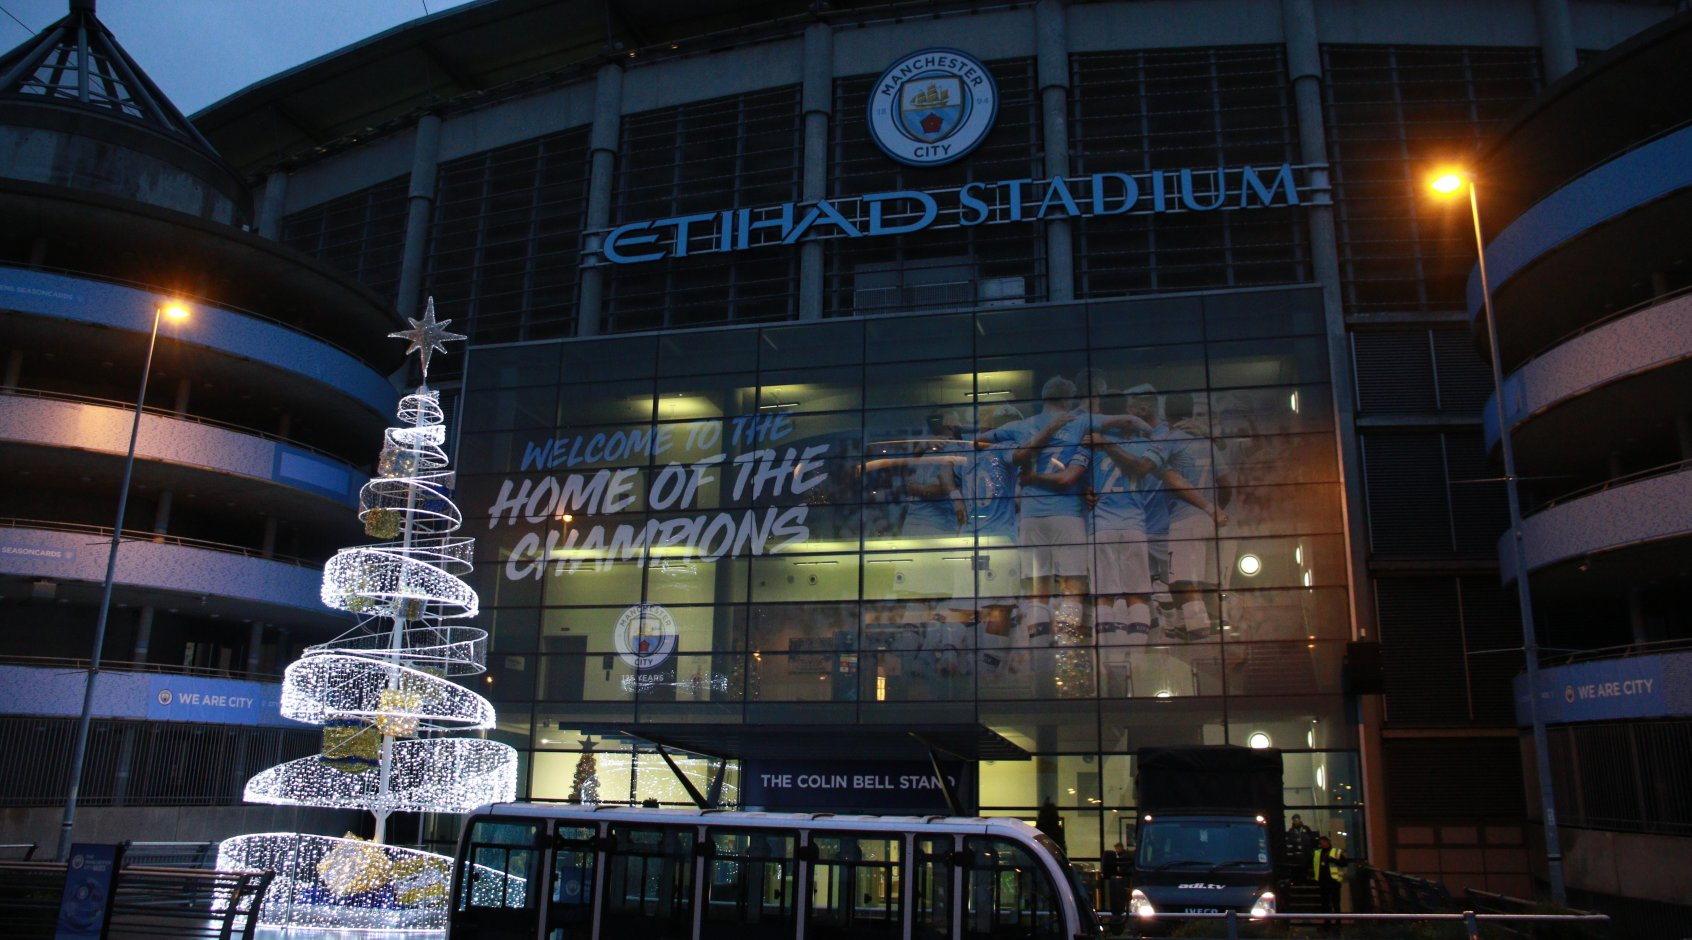 """Манчестер Сити"" на два года отстранили от еврокубков за финансовые махинации"